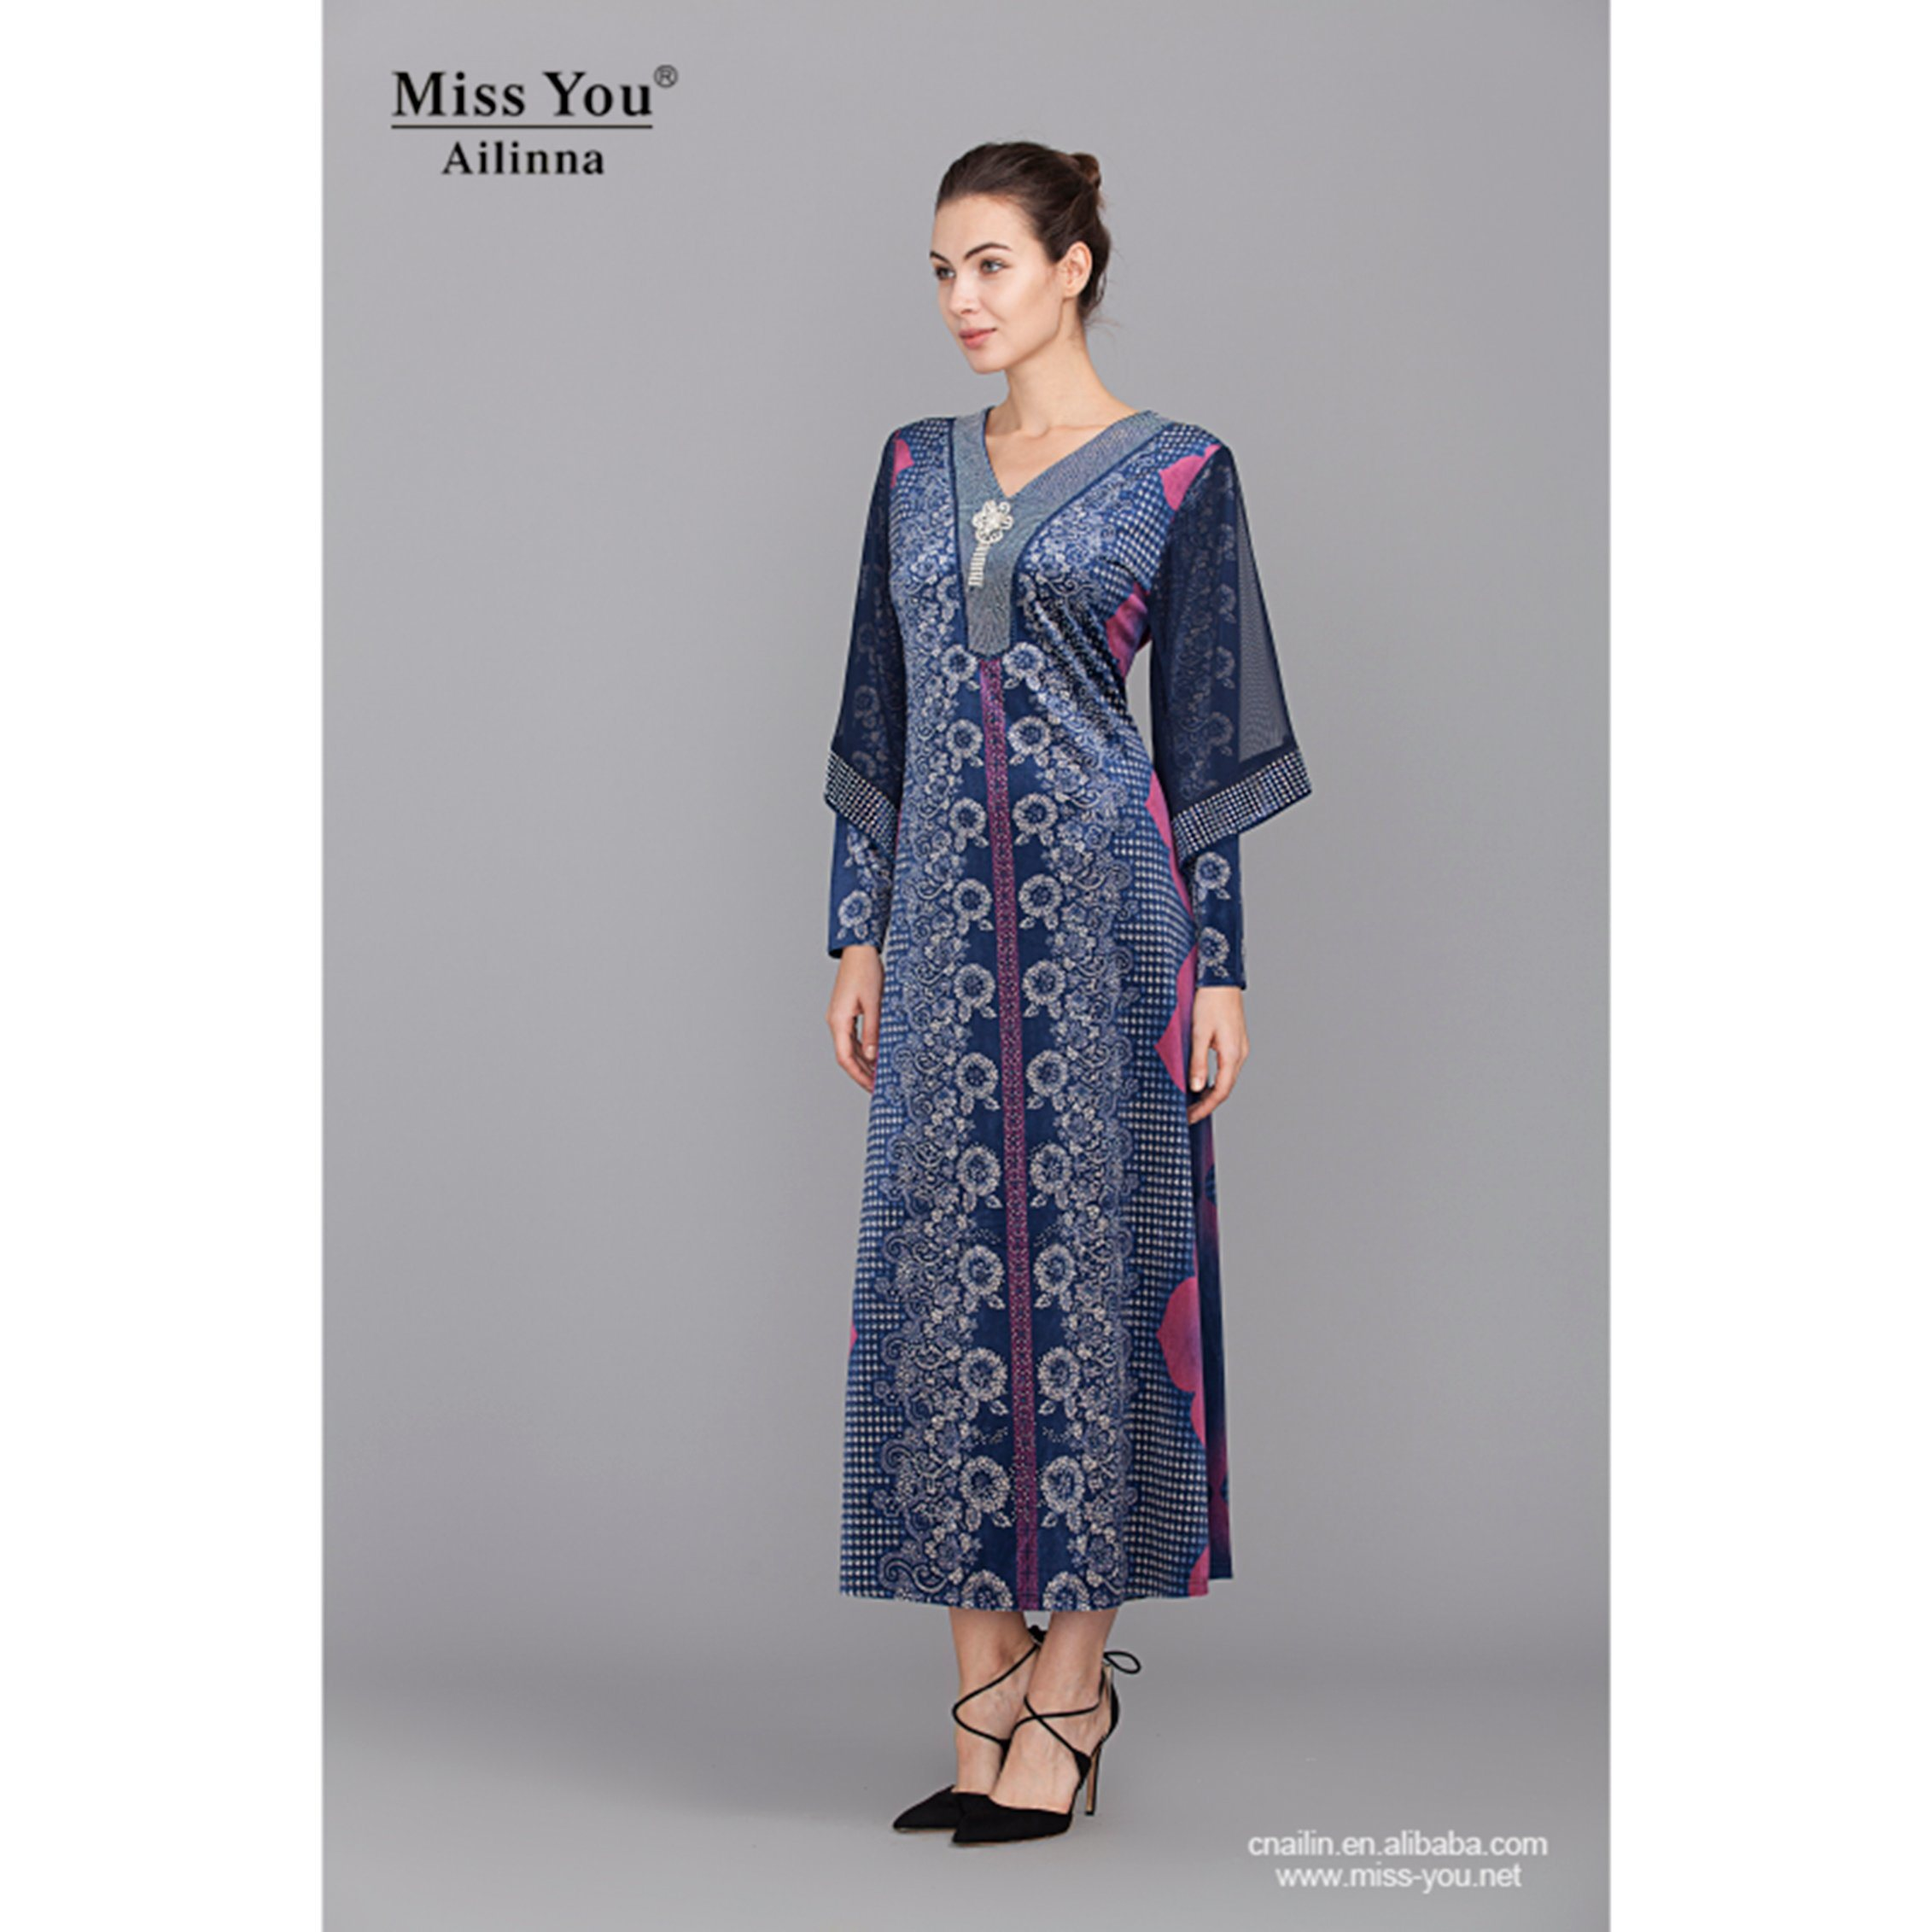 Miss You Ailinna 801895 Ethnic Beautiful Long Maxi Dress